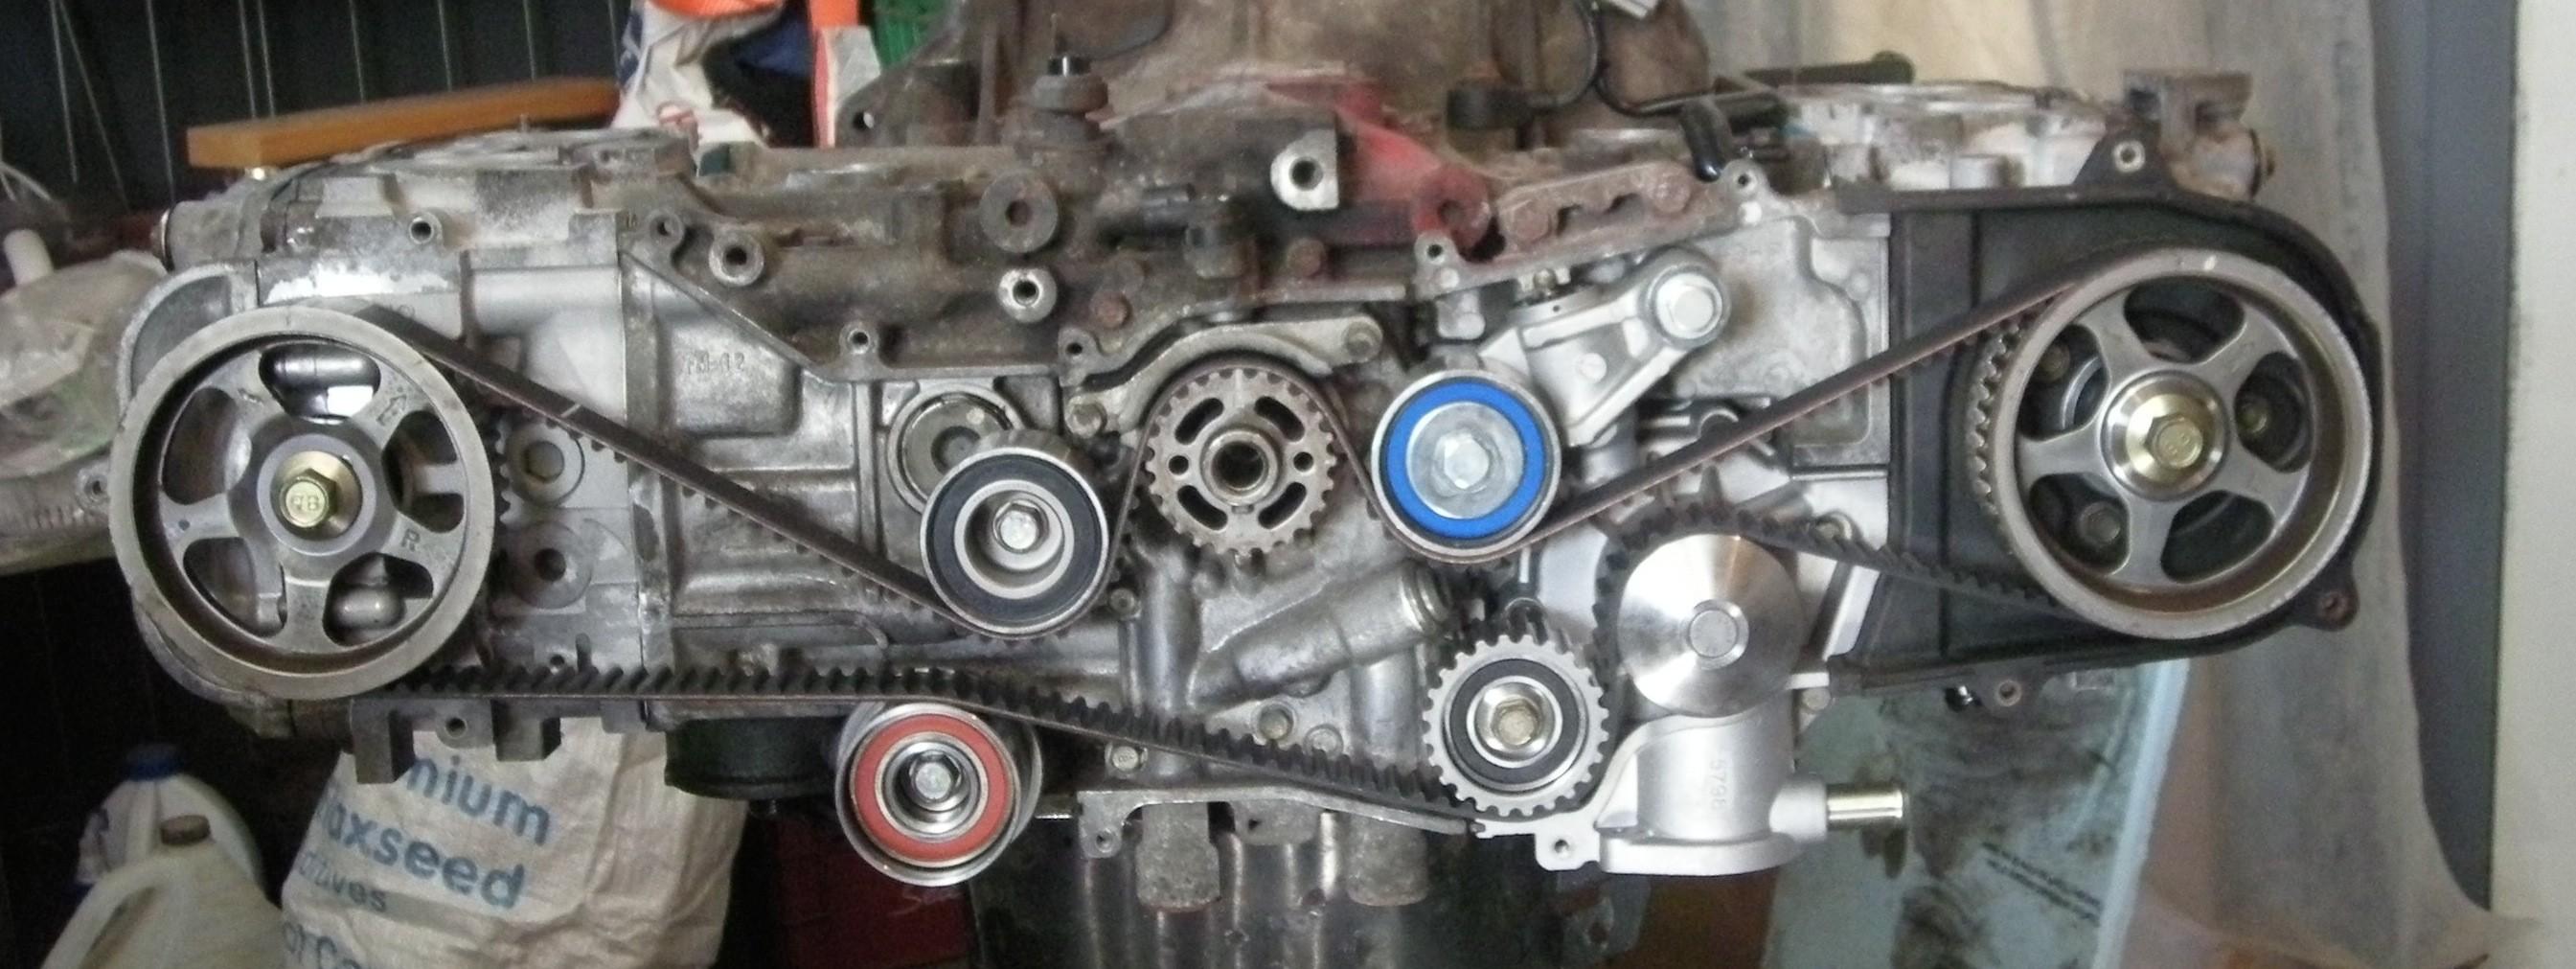 Boxer Engine Diagram How to Set Timing Timing Belt Change On A Subaru sohc Ej25 Of Boxer Engine Diagram